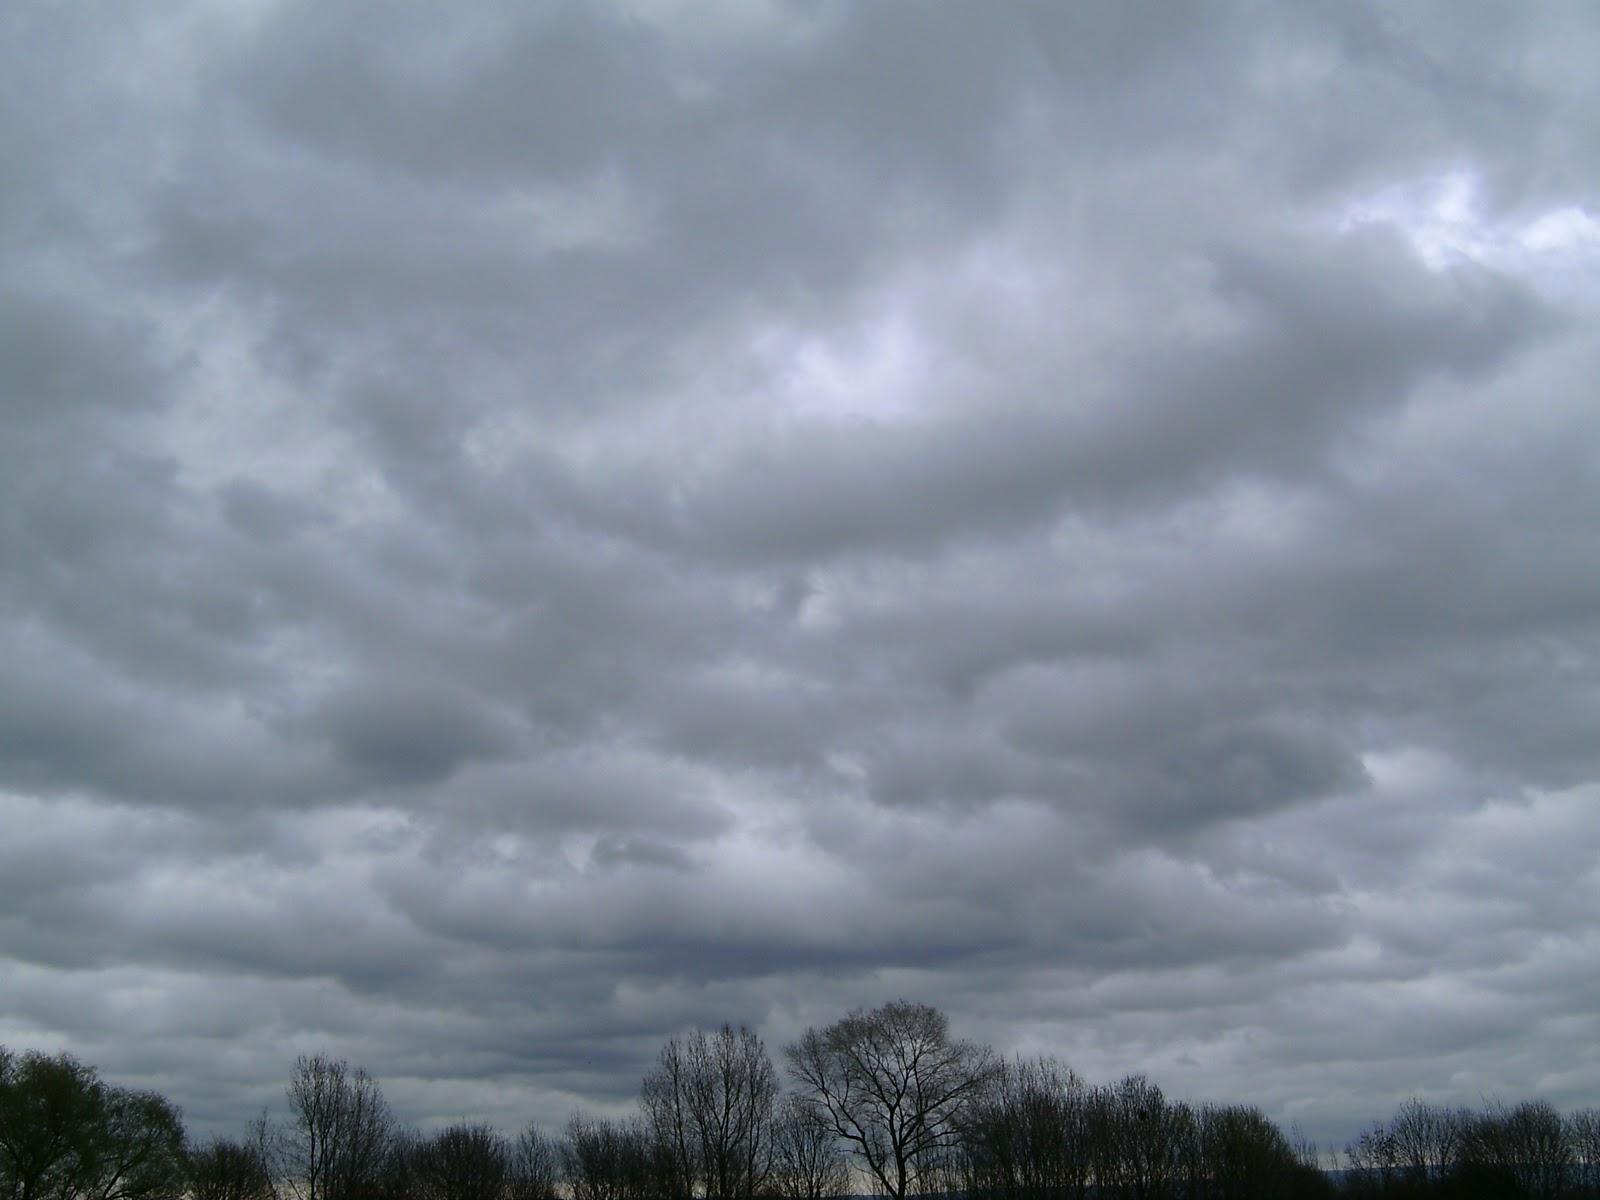 Sky Pictures: Dark Rain Clouds